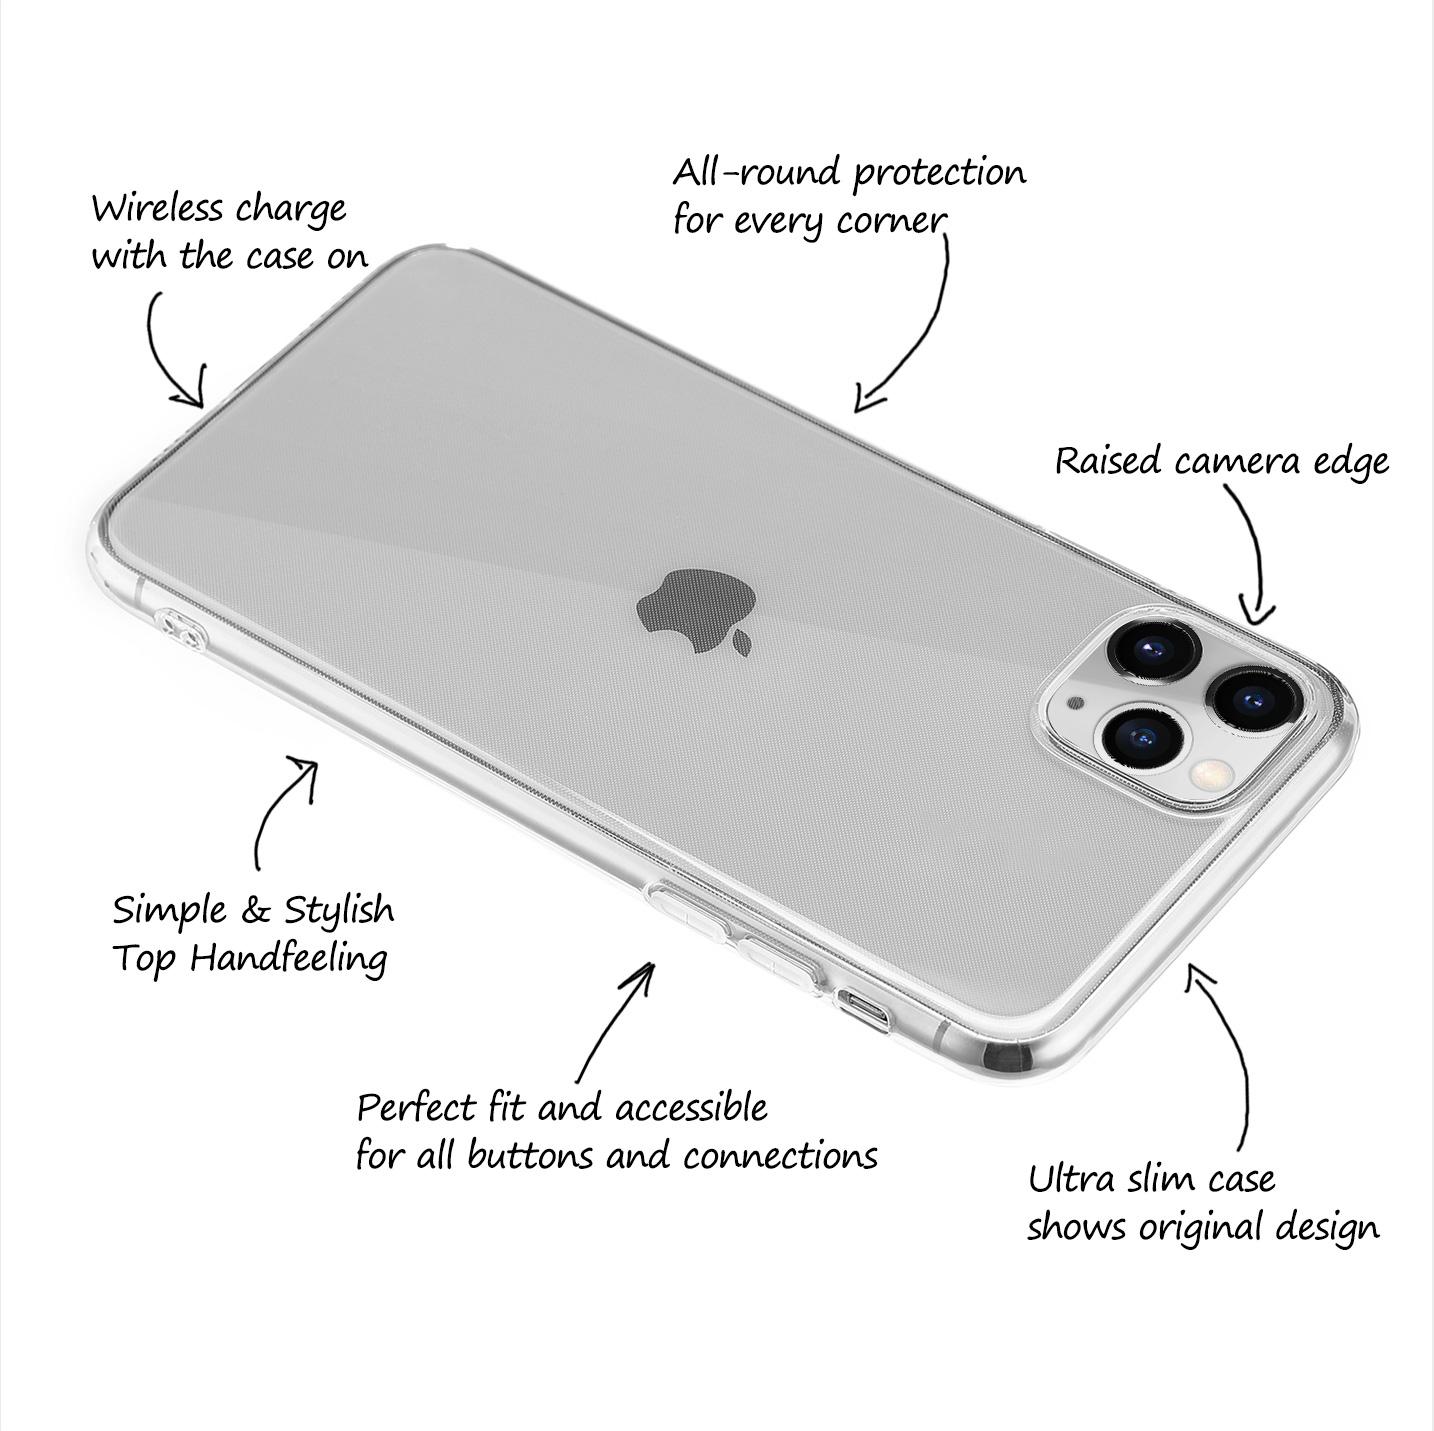 Ultra-Slim-Case-iPhone-11-Pro-5-8-034-Matt-Clear-Schutz-Huelle-Skin-Cover-Etui-Folie Indexbild 50